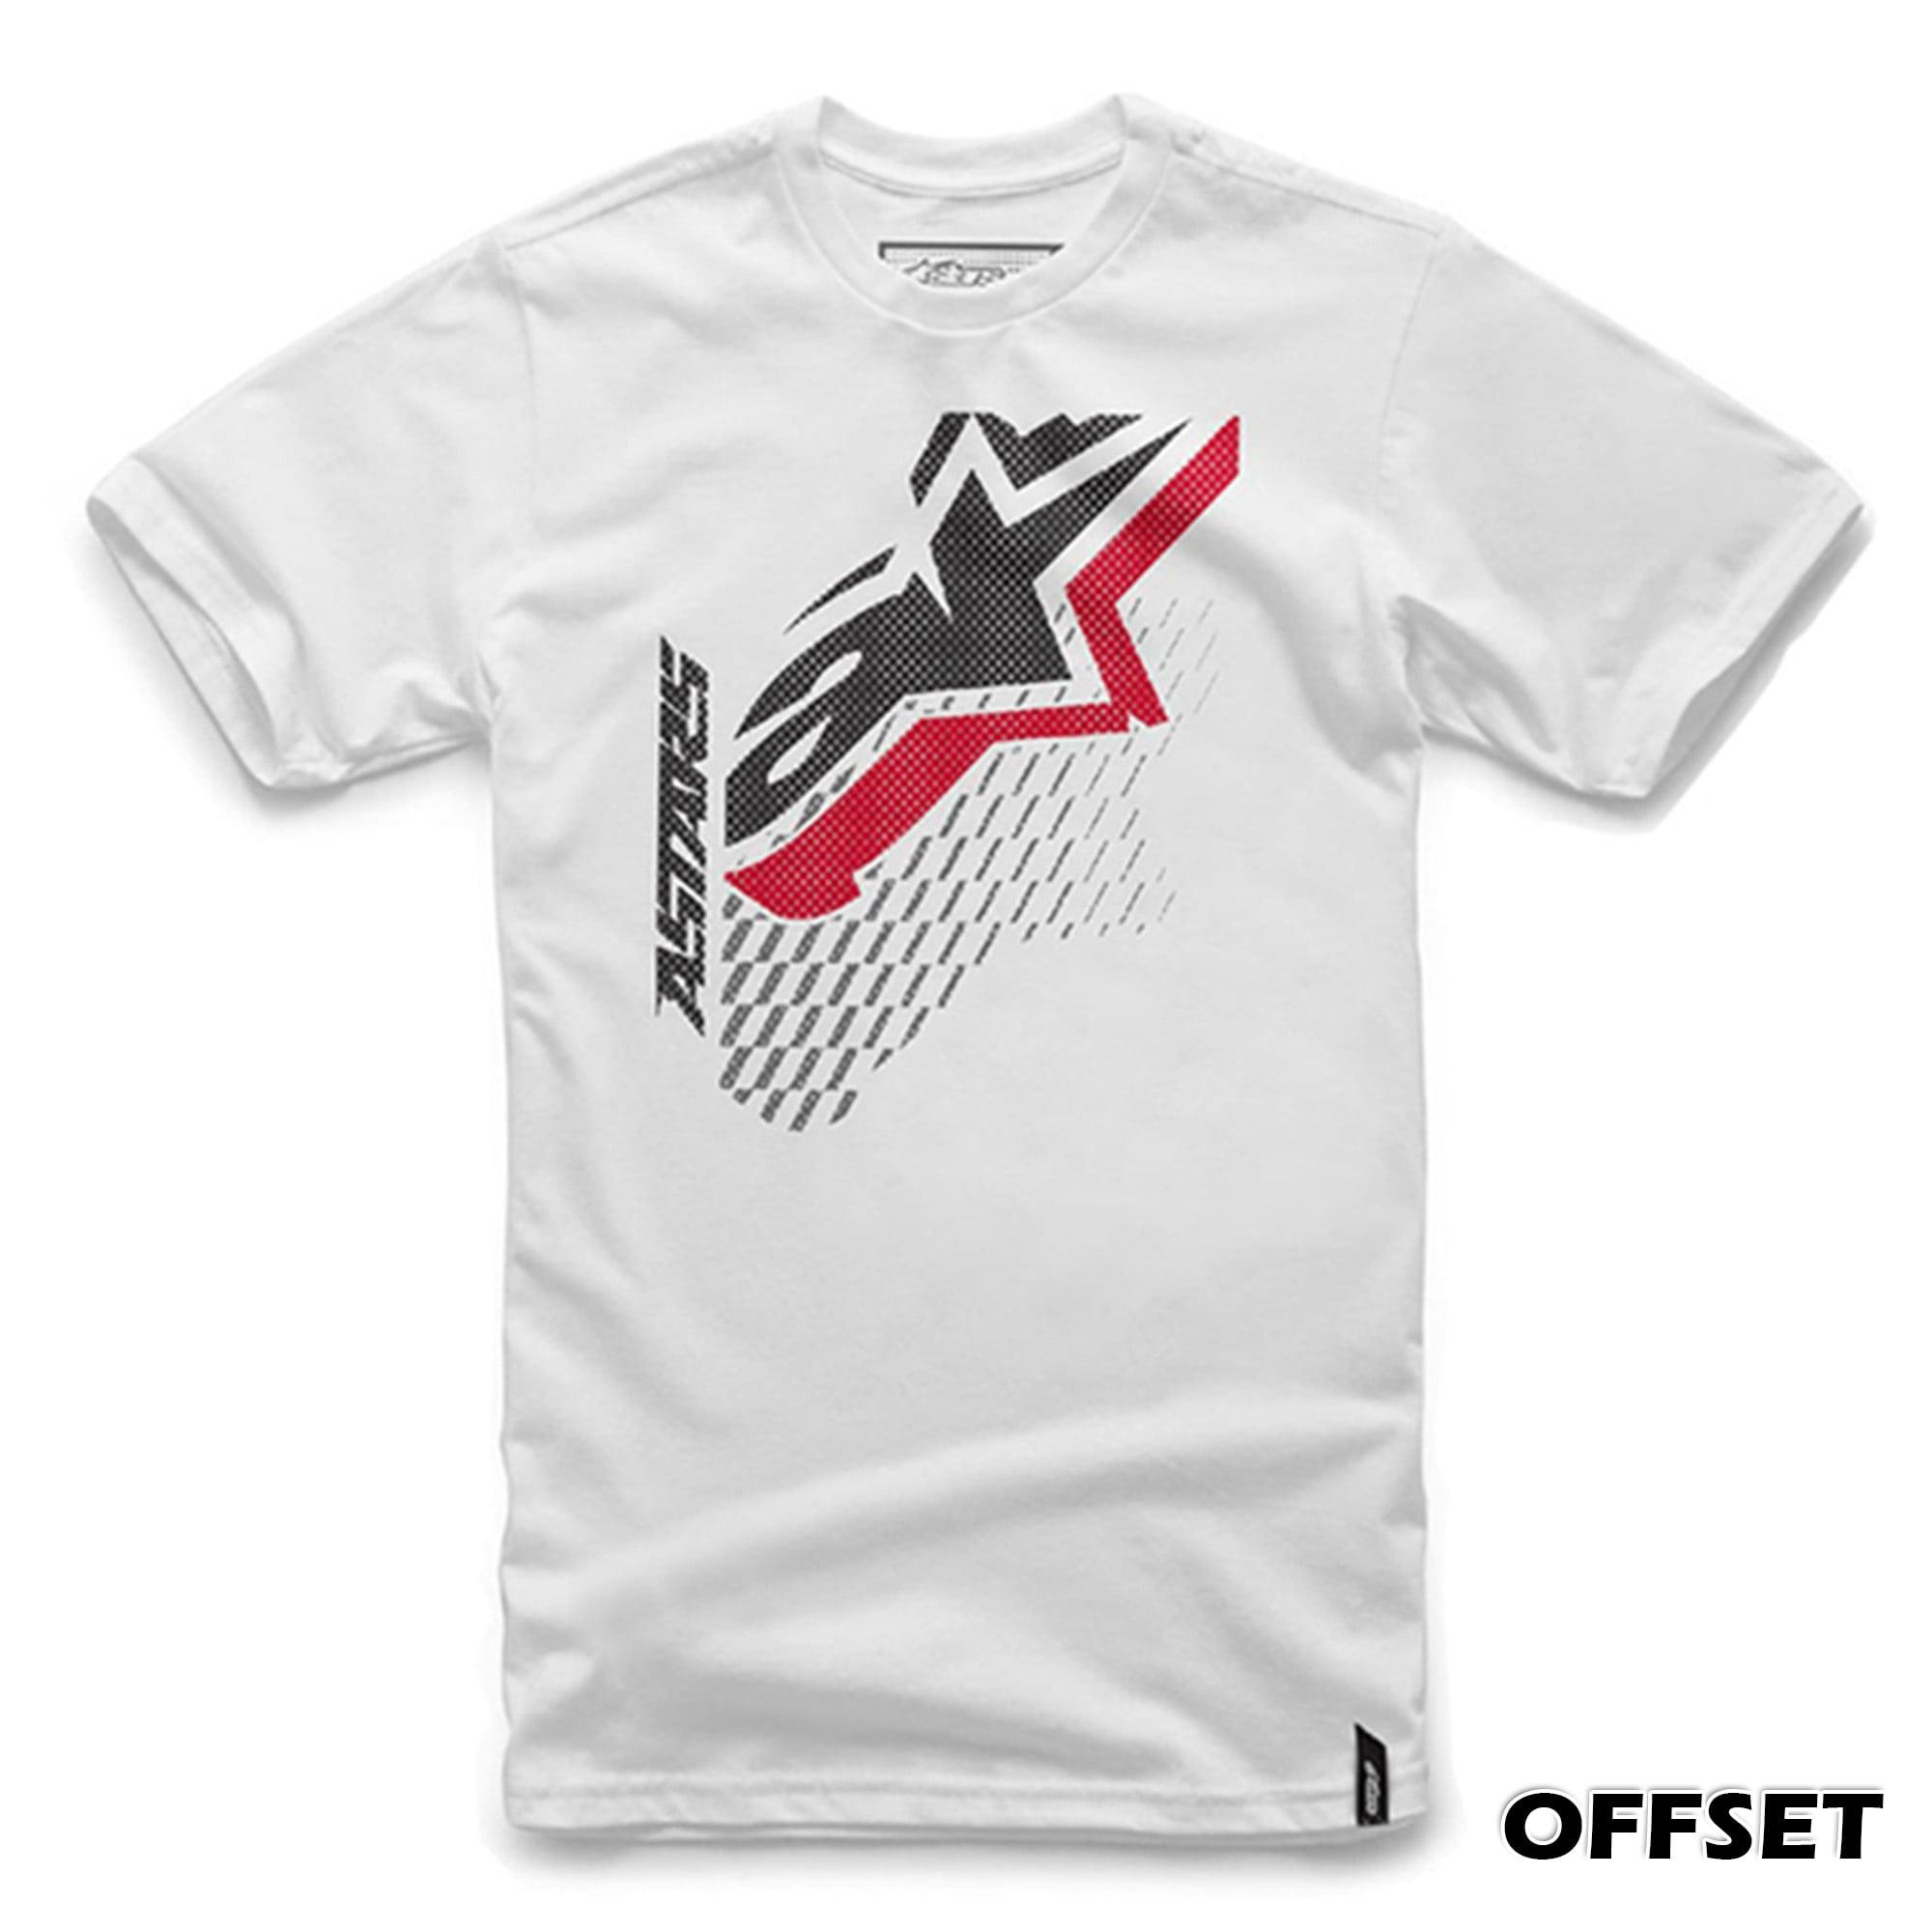 Camiseta Alpinestars Offset  - HP Race Off Road